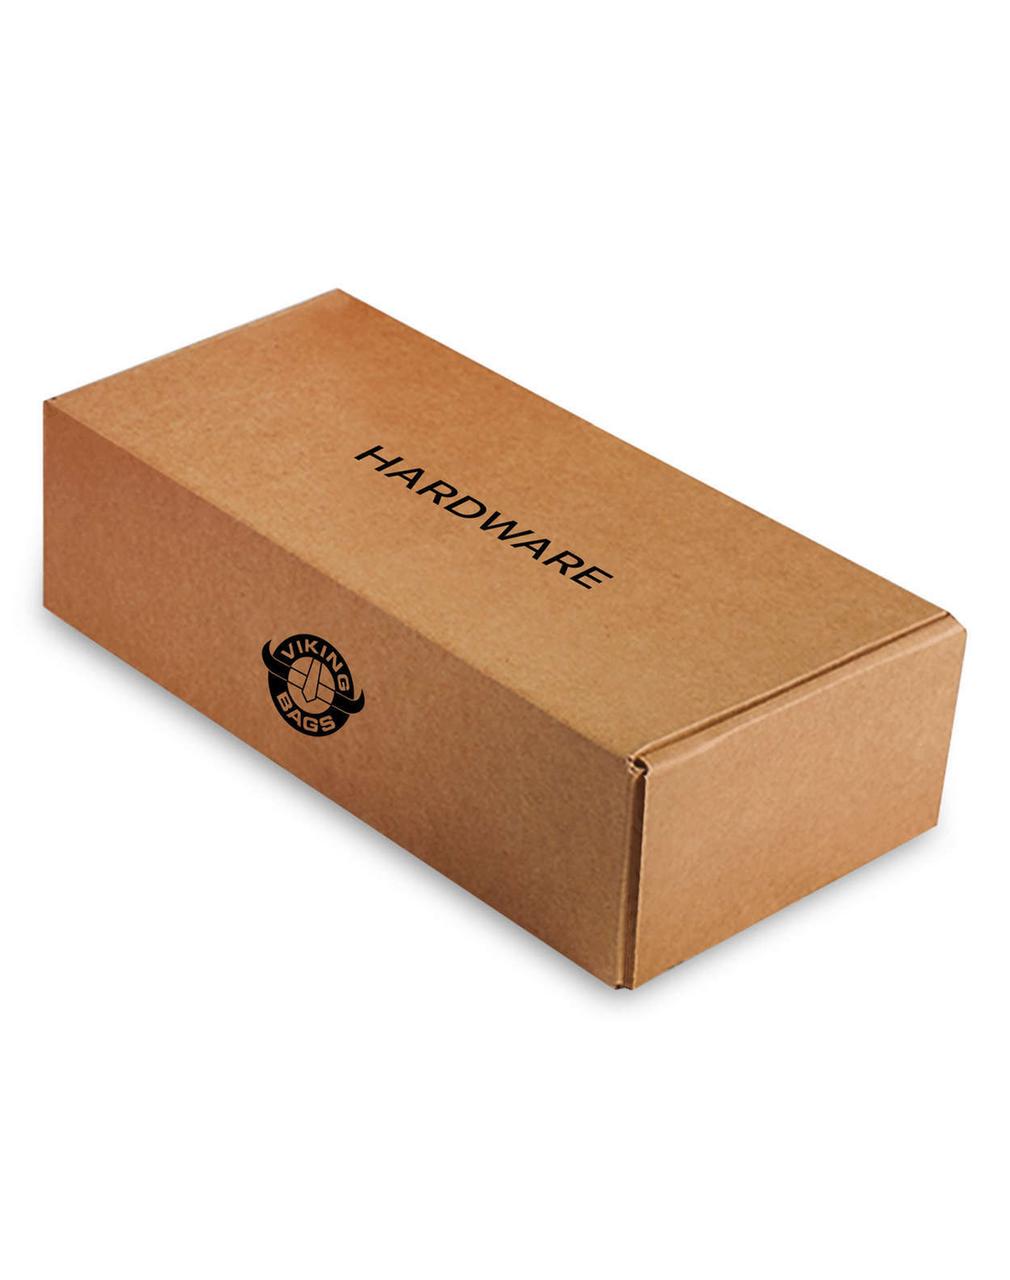 Triumph Thunderbird Spear Shock Cutout Large Motorcycle Saddlebags Box